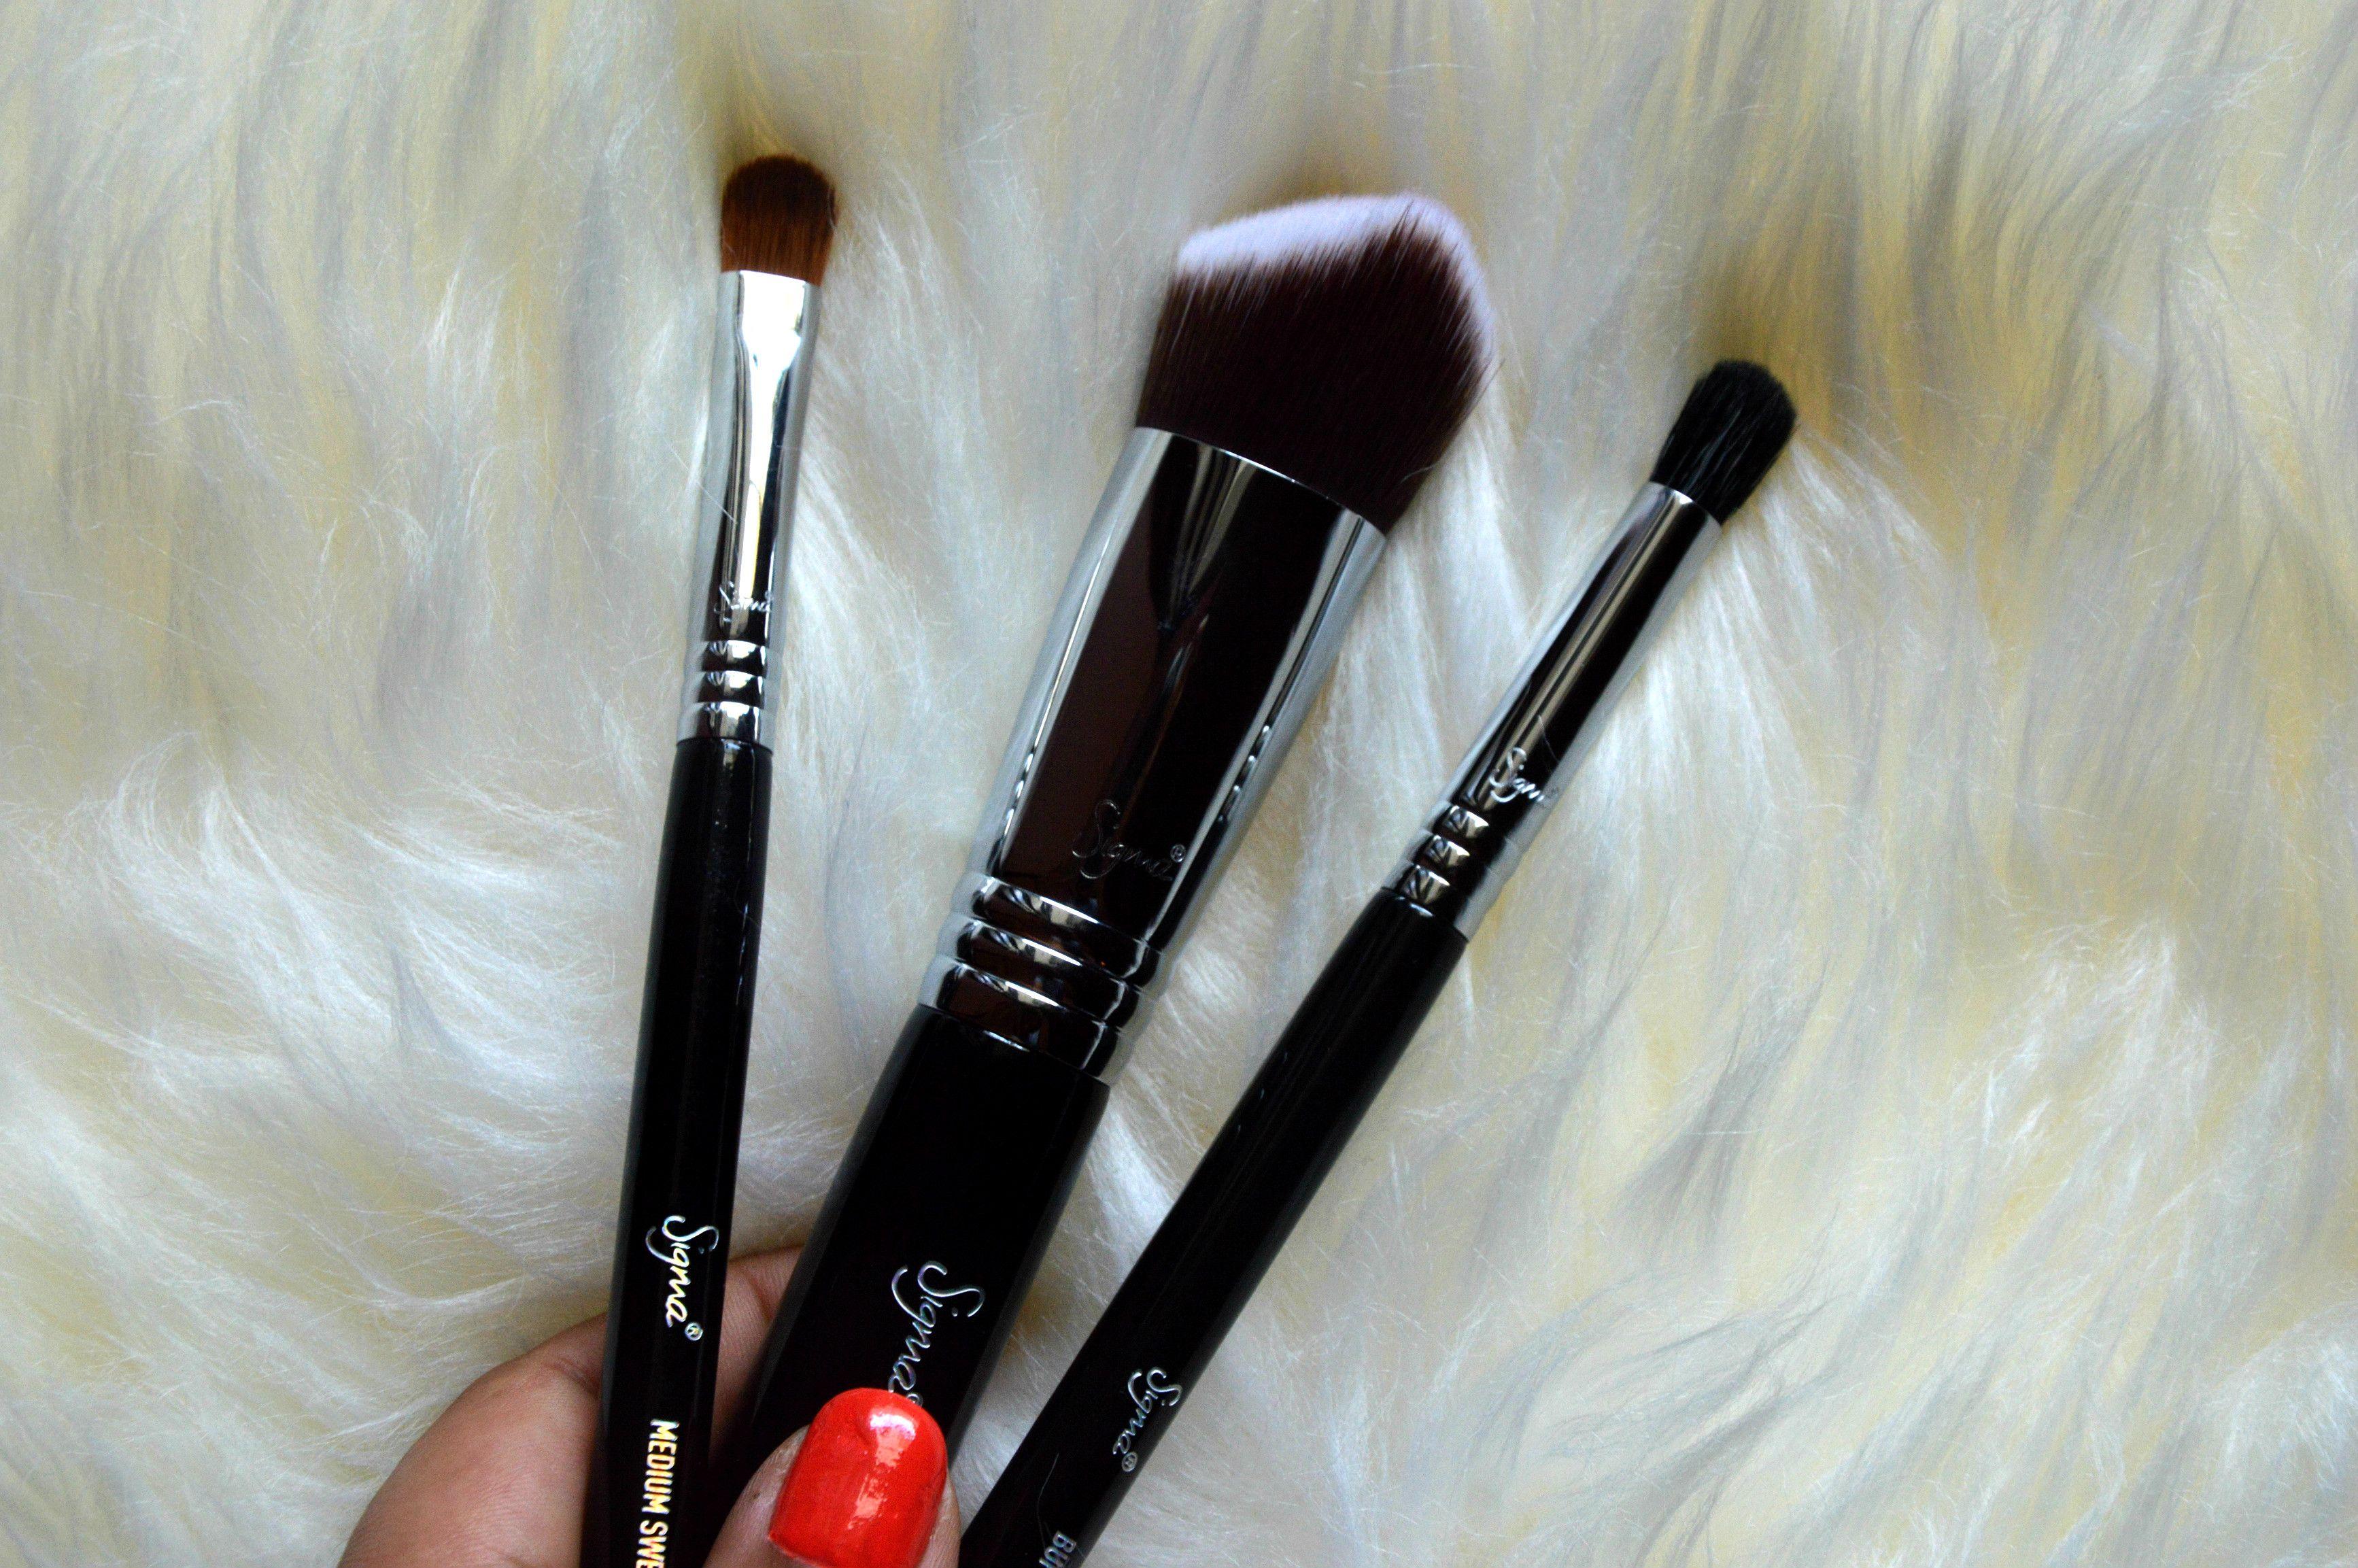 Sigma Makeup Brushes Review 3DHD Kabuki, E39 & E54 (With